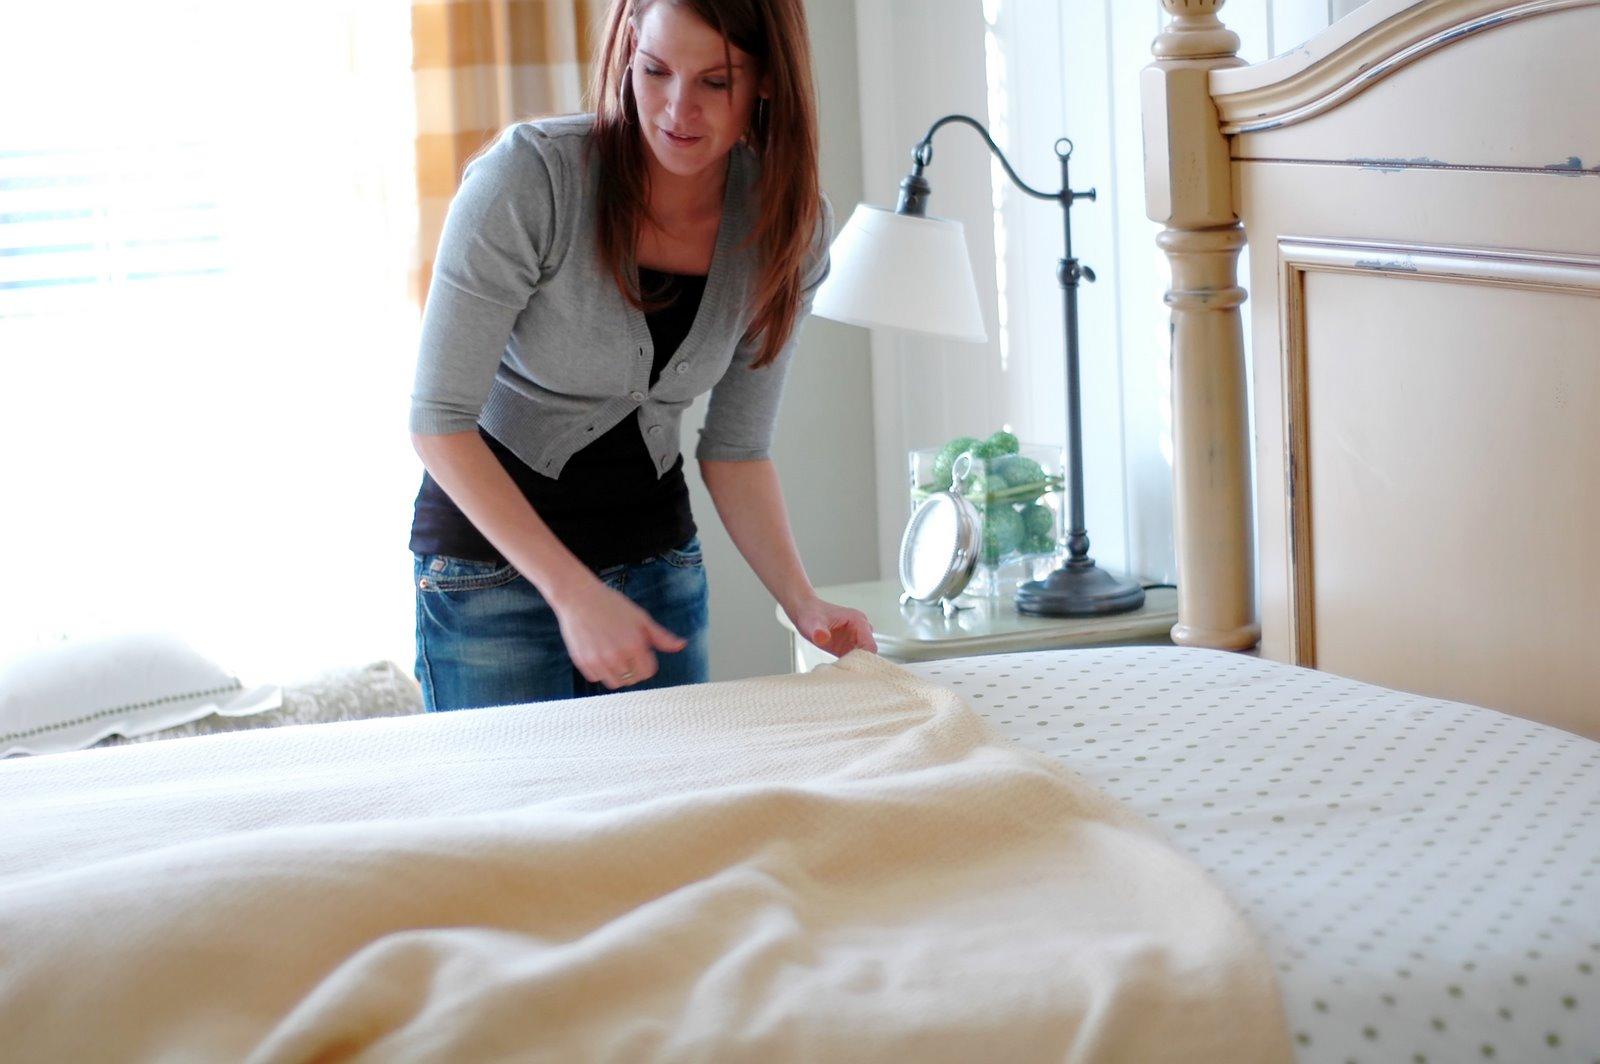 Best Bed Sheets For Pillow Top Queen